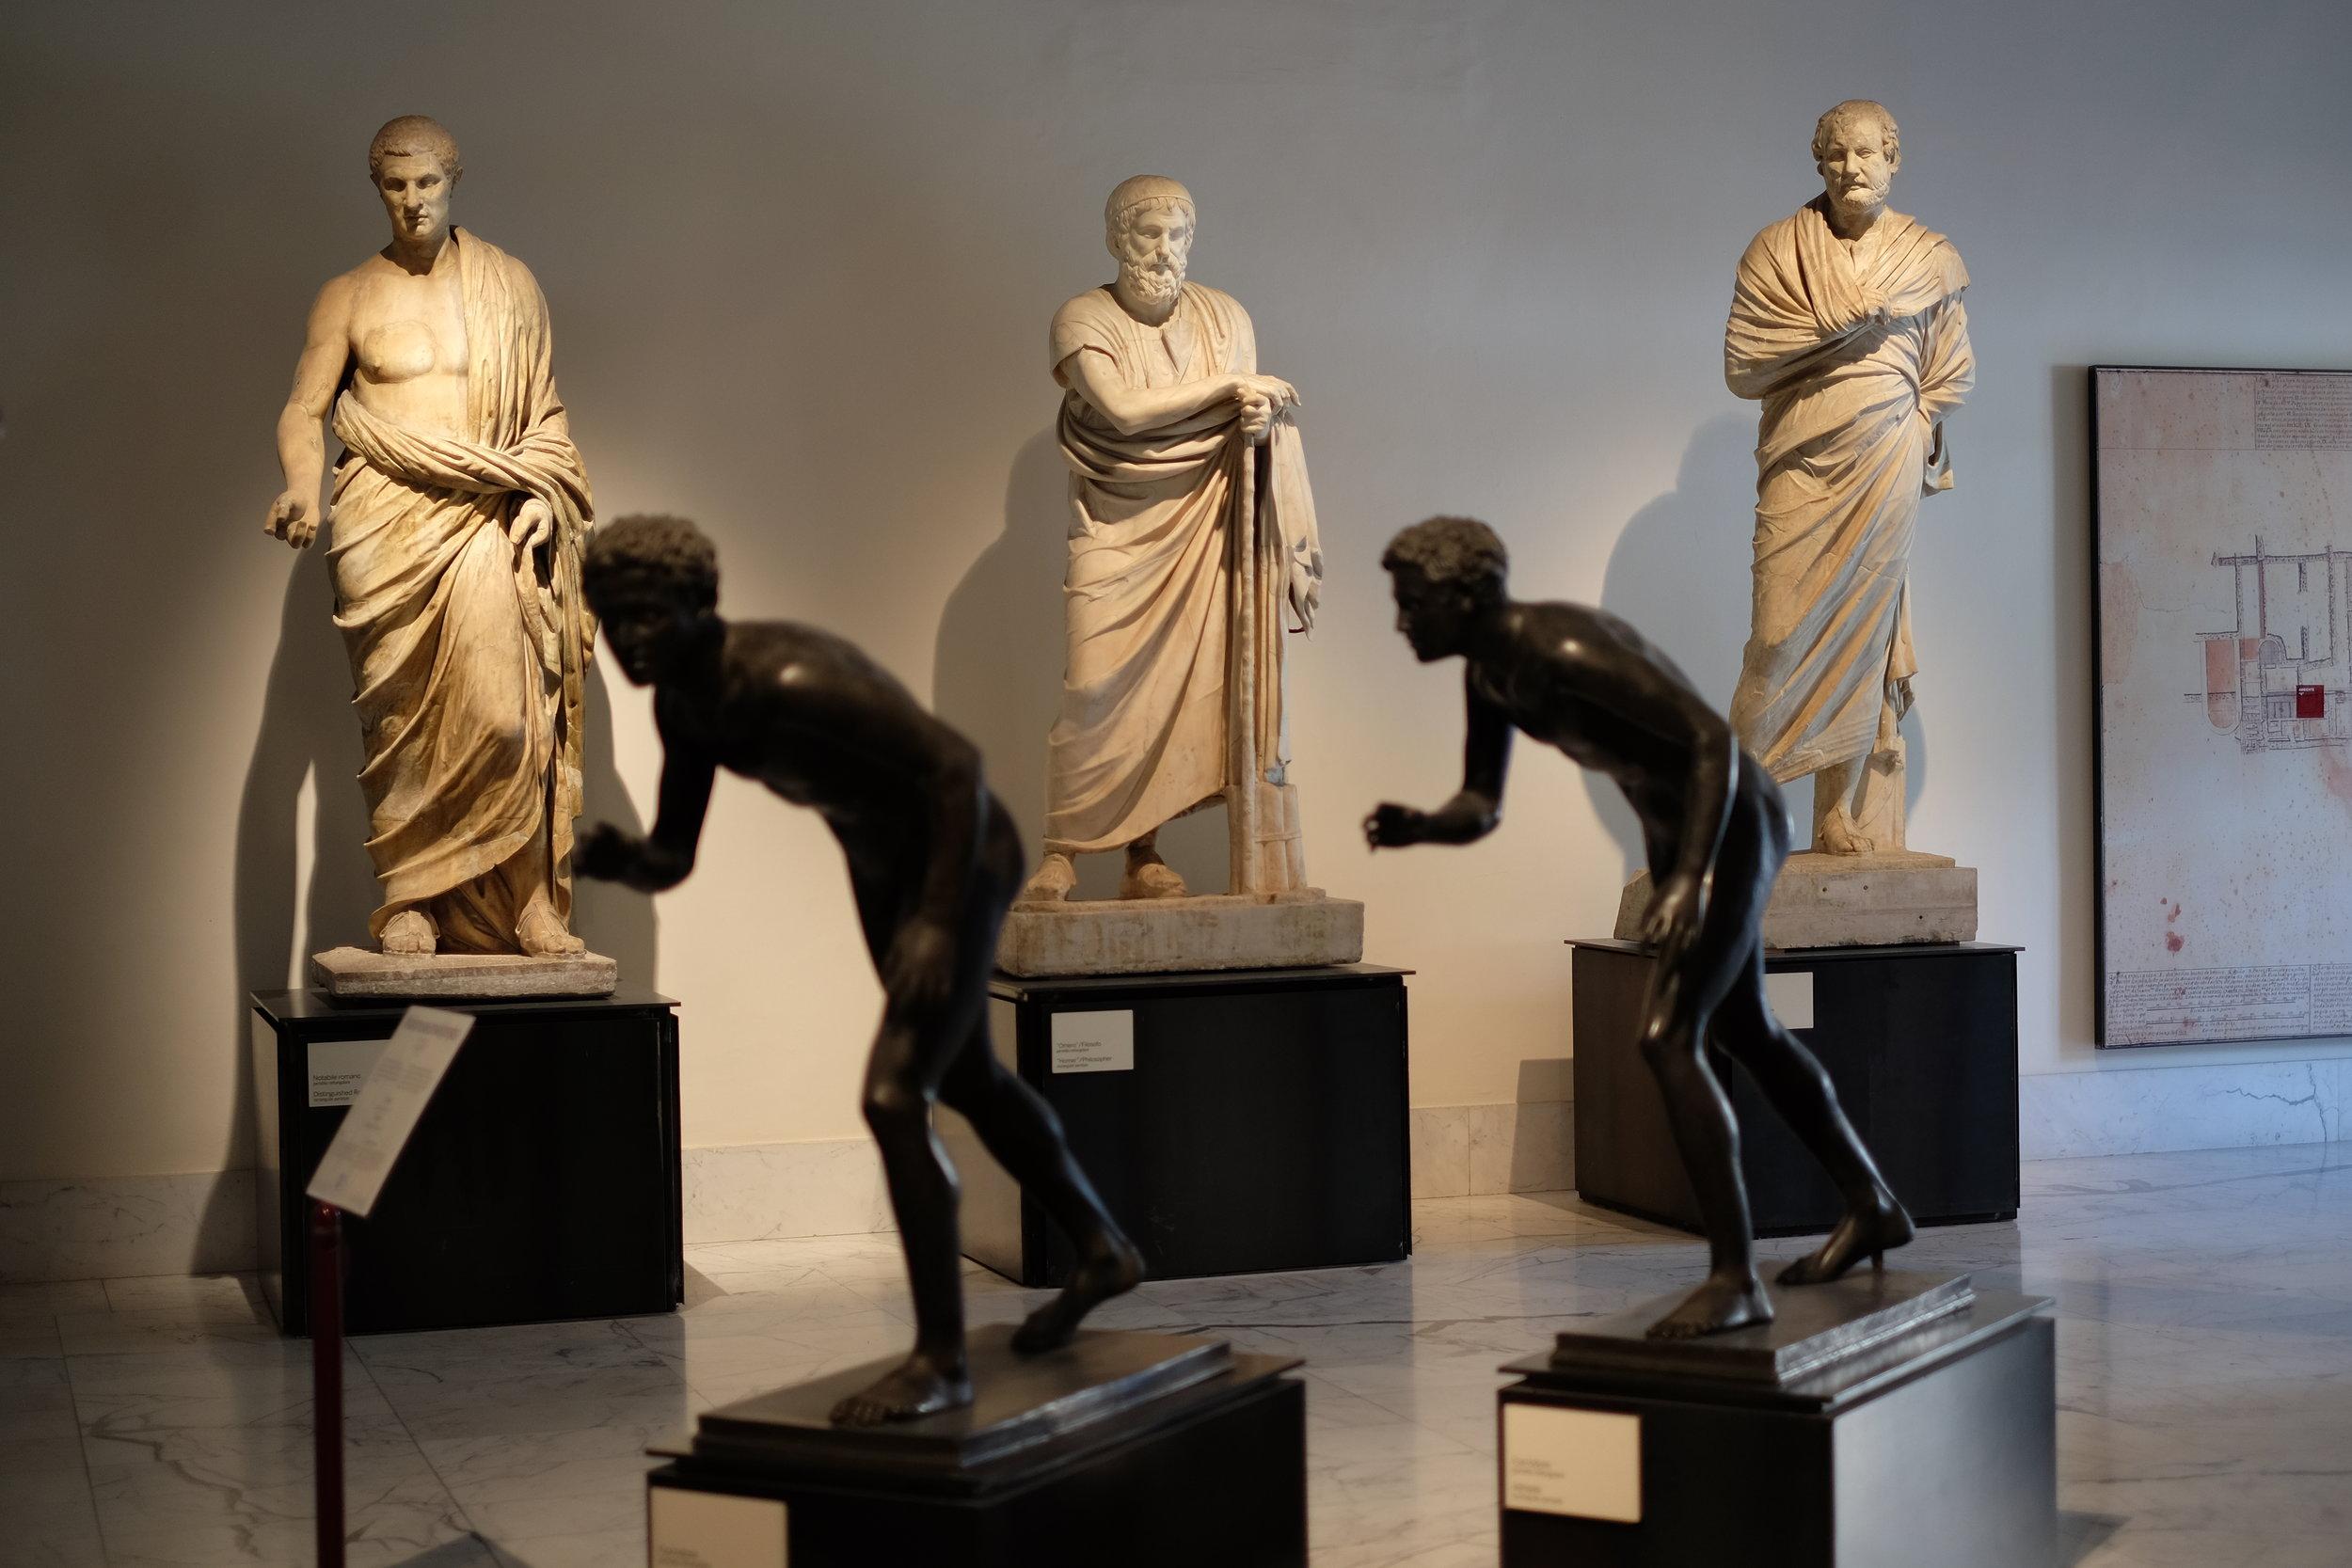 Philosophers and athletes from the Villa dei Papiri.